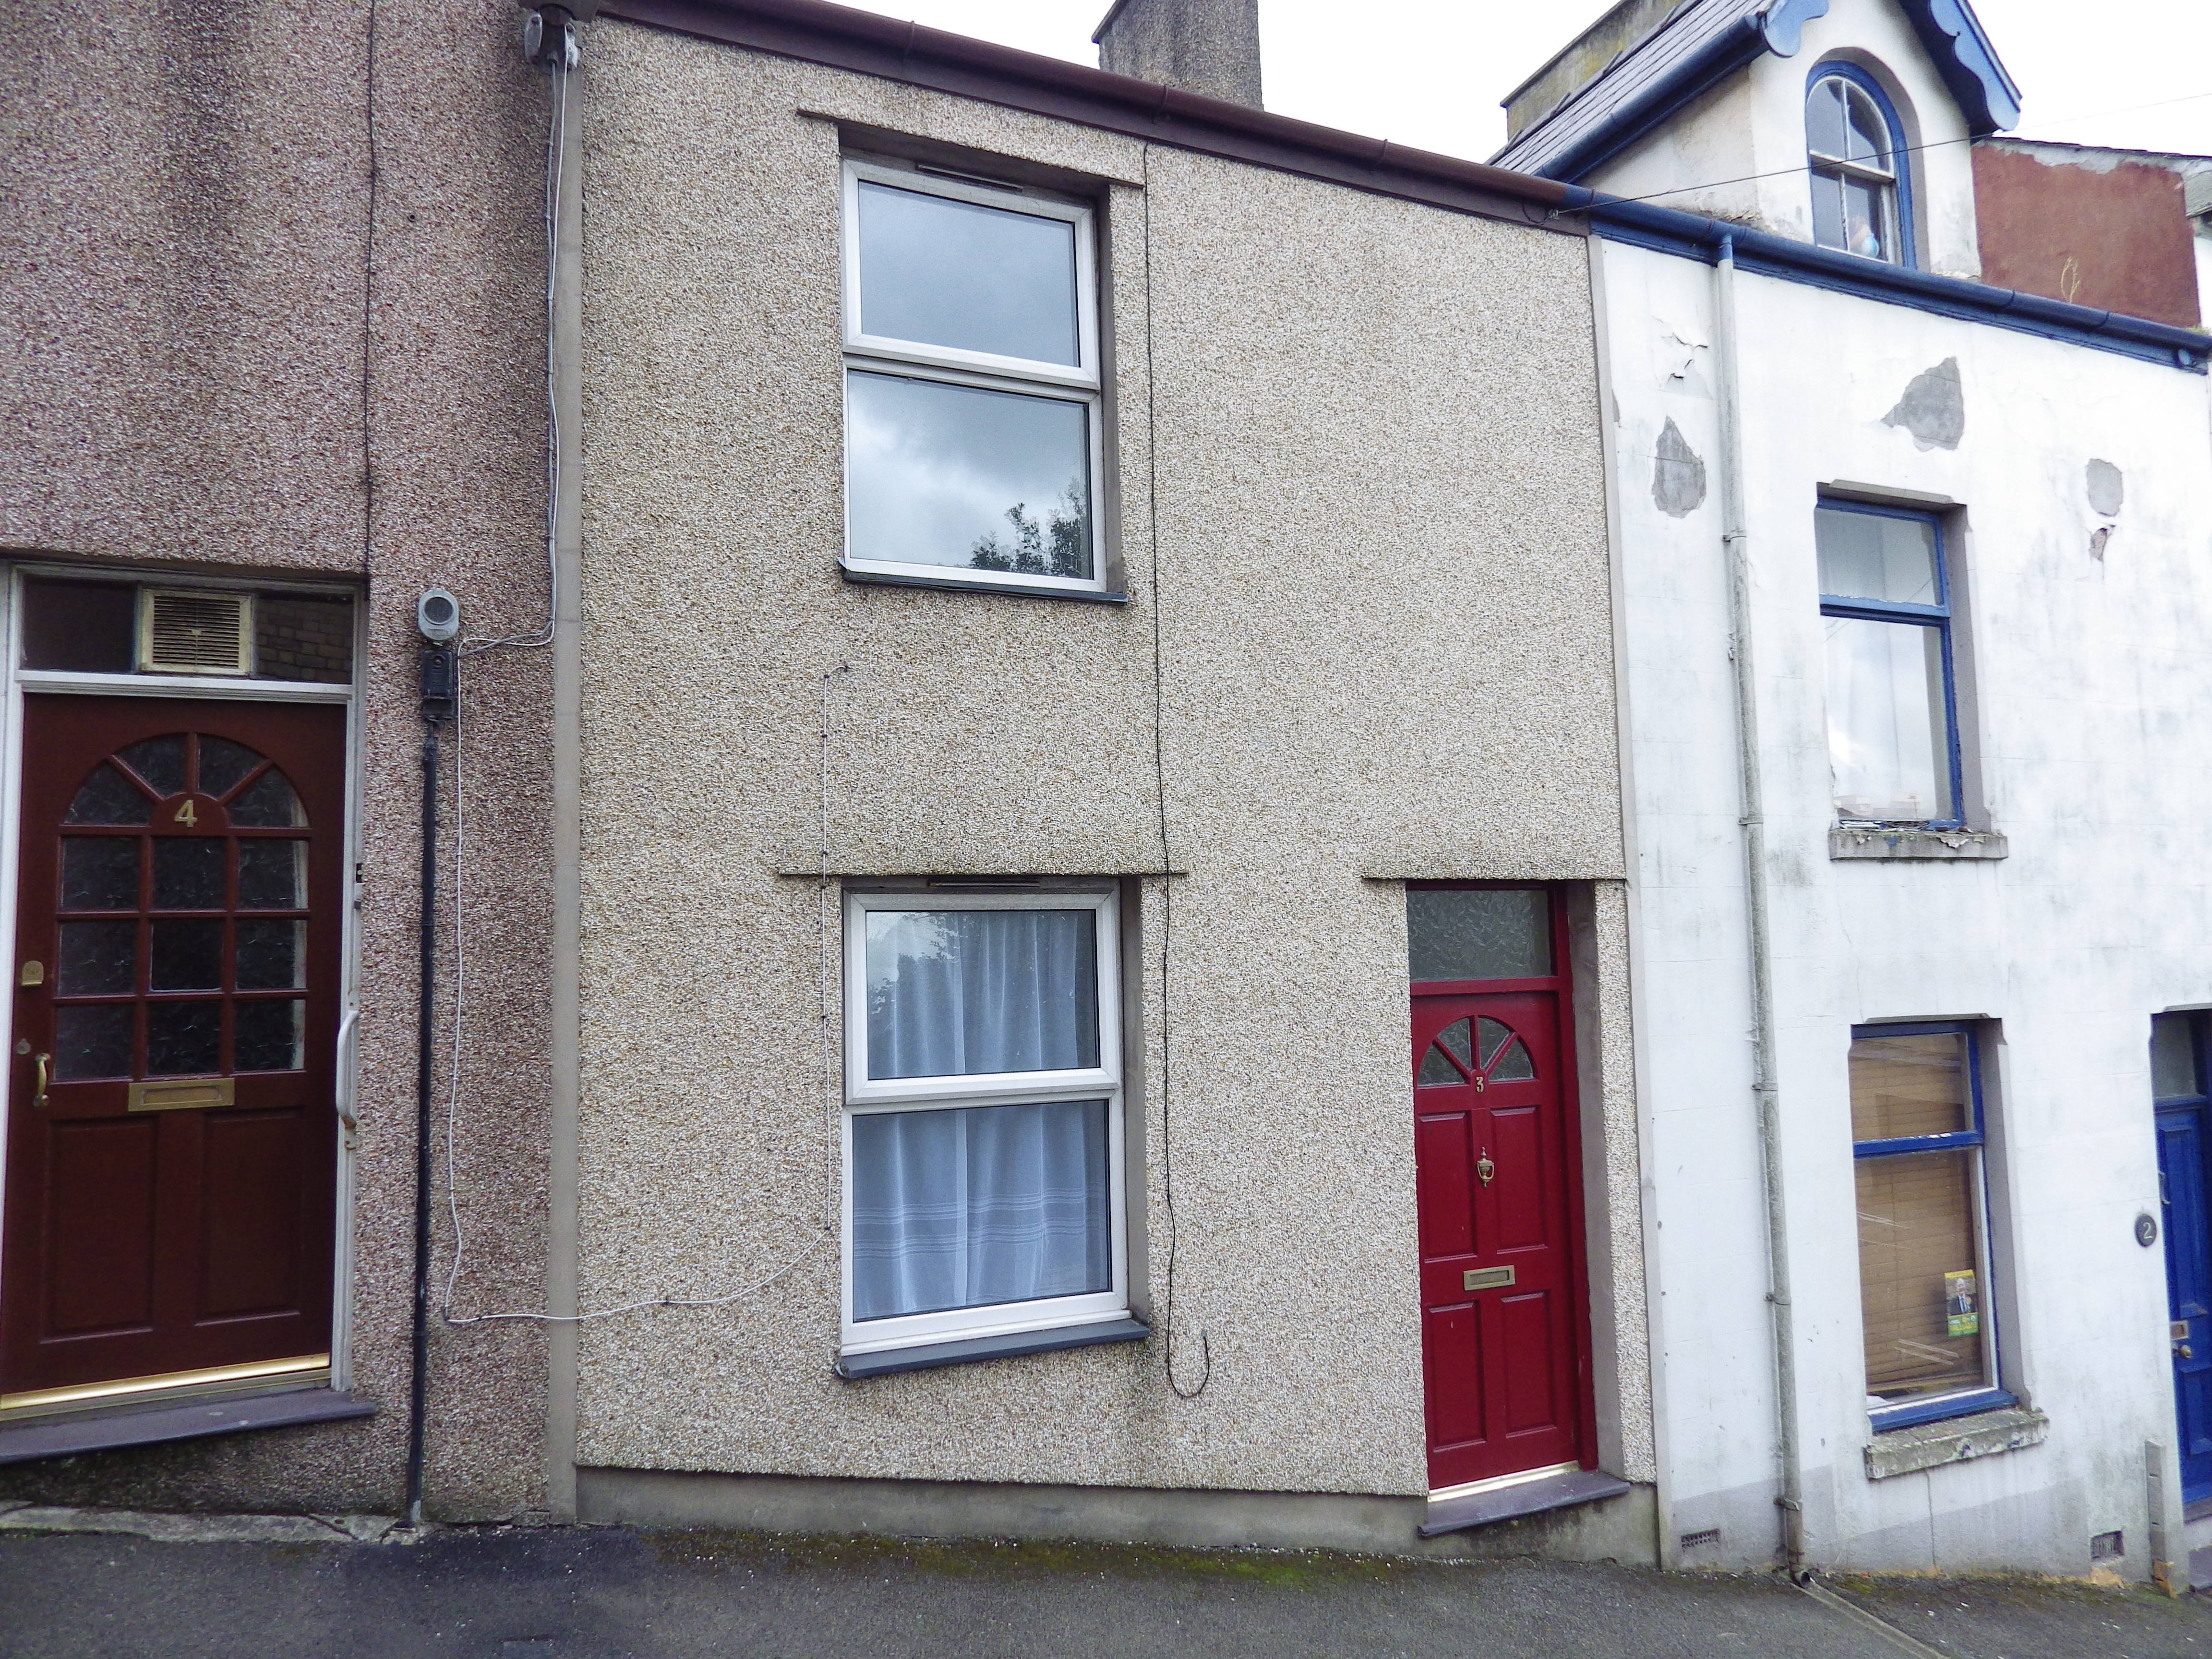 Rowland Street, Caernarfon, North Wales